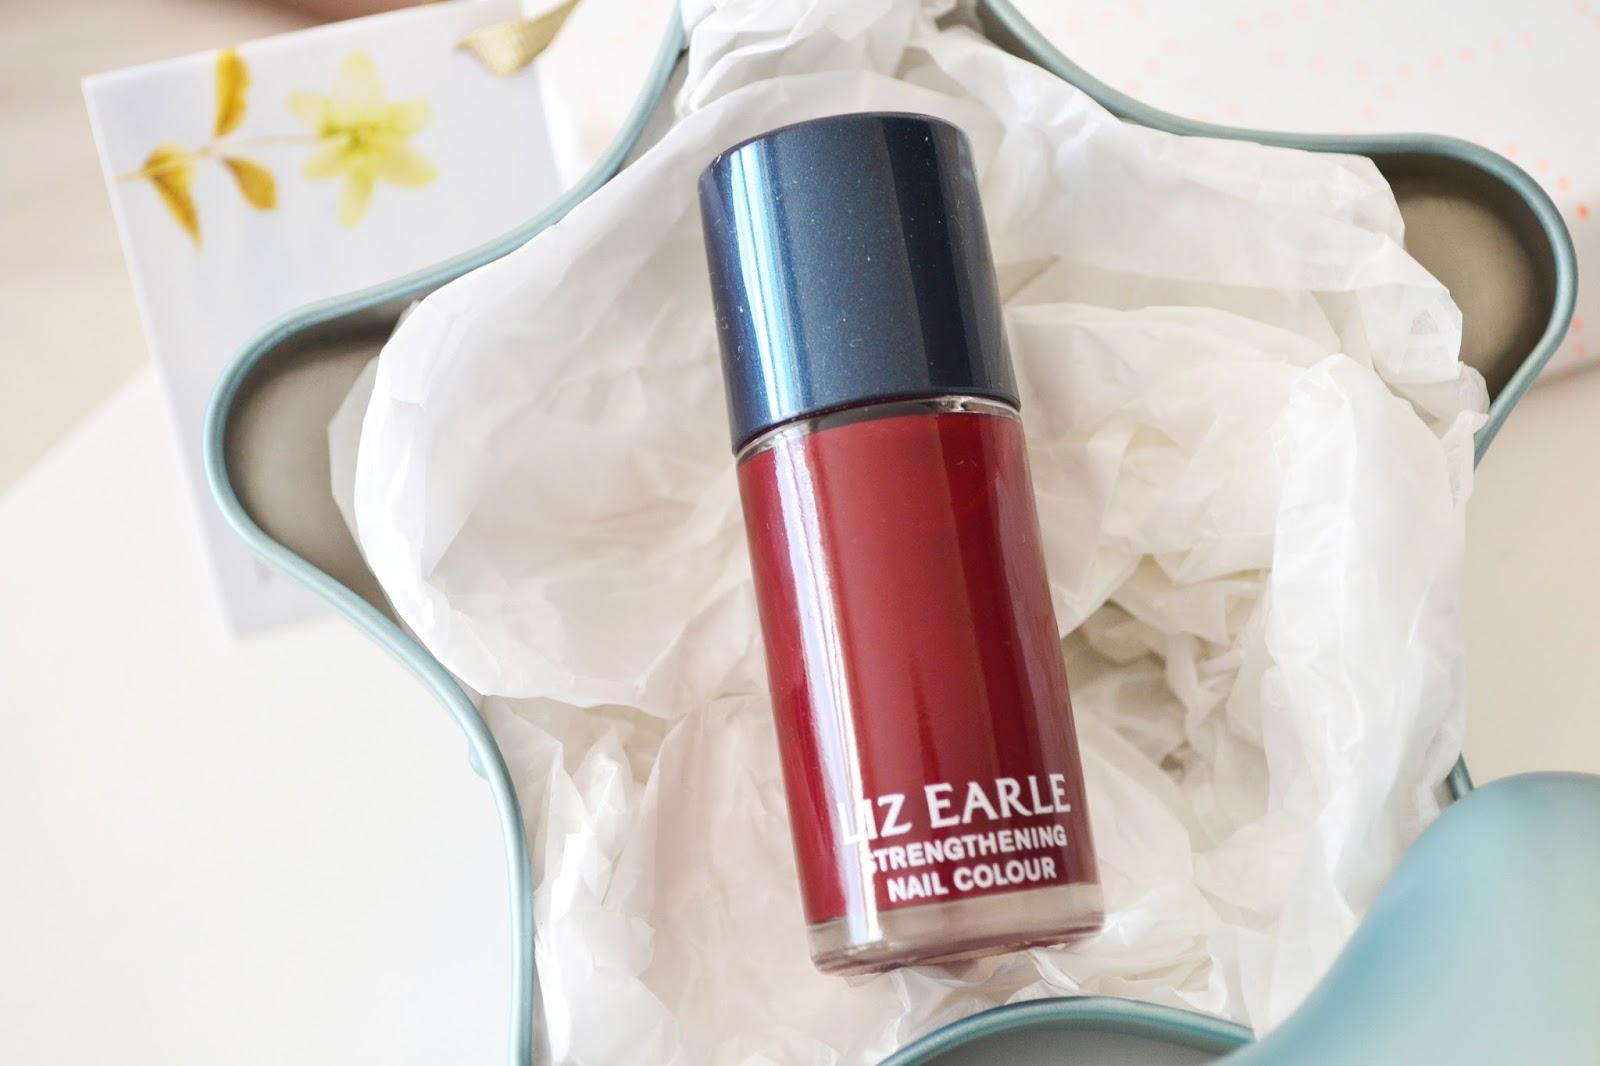 liz earle pure poetry nail polish, red nail polish, liz earle nail colour